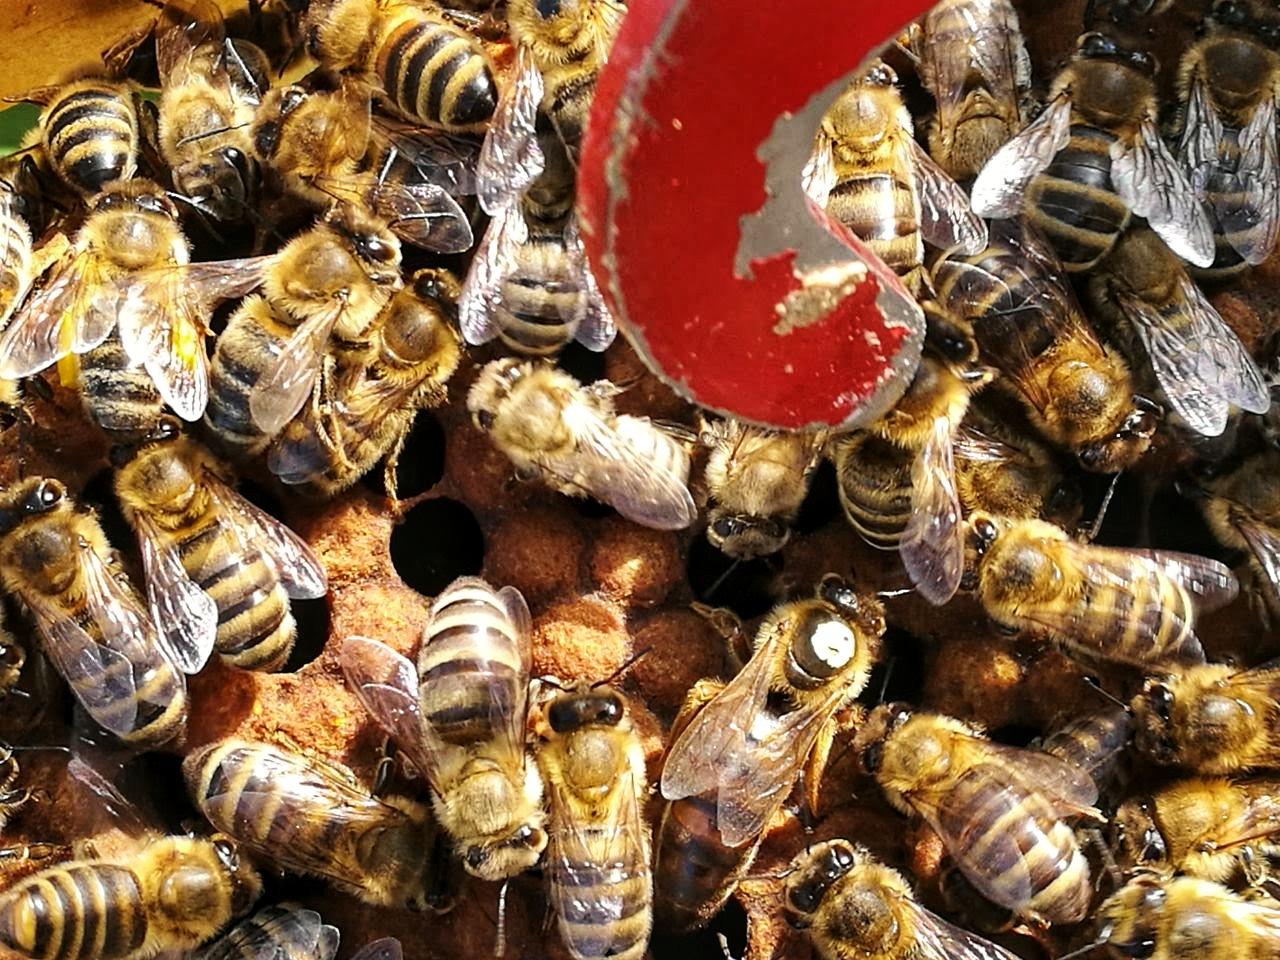 Halten Honigbienen Winterschlaf?